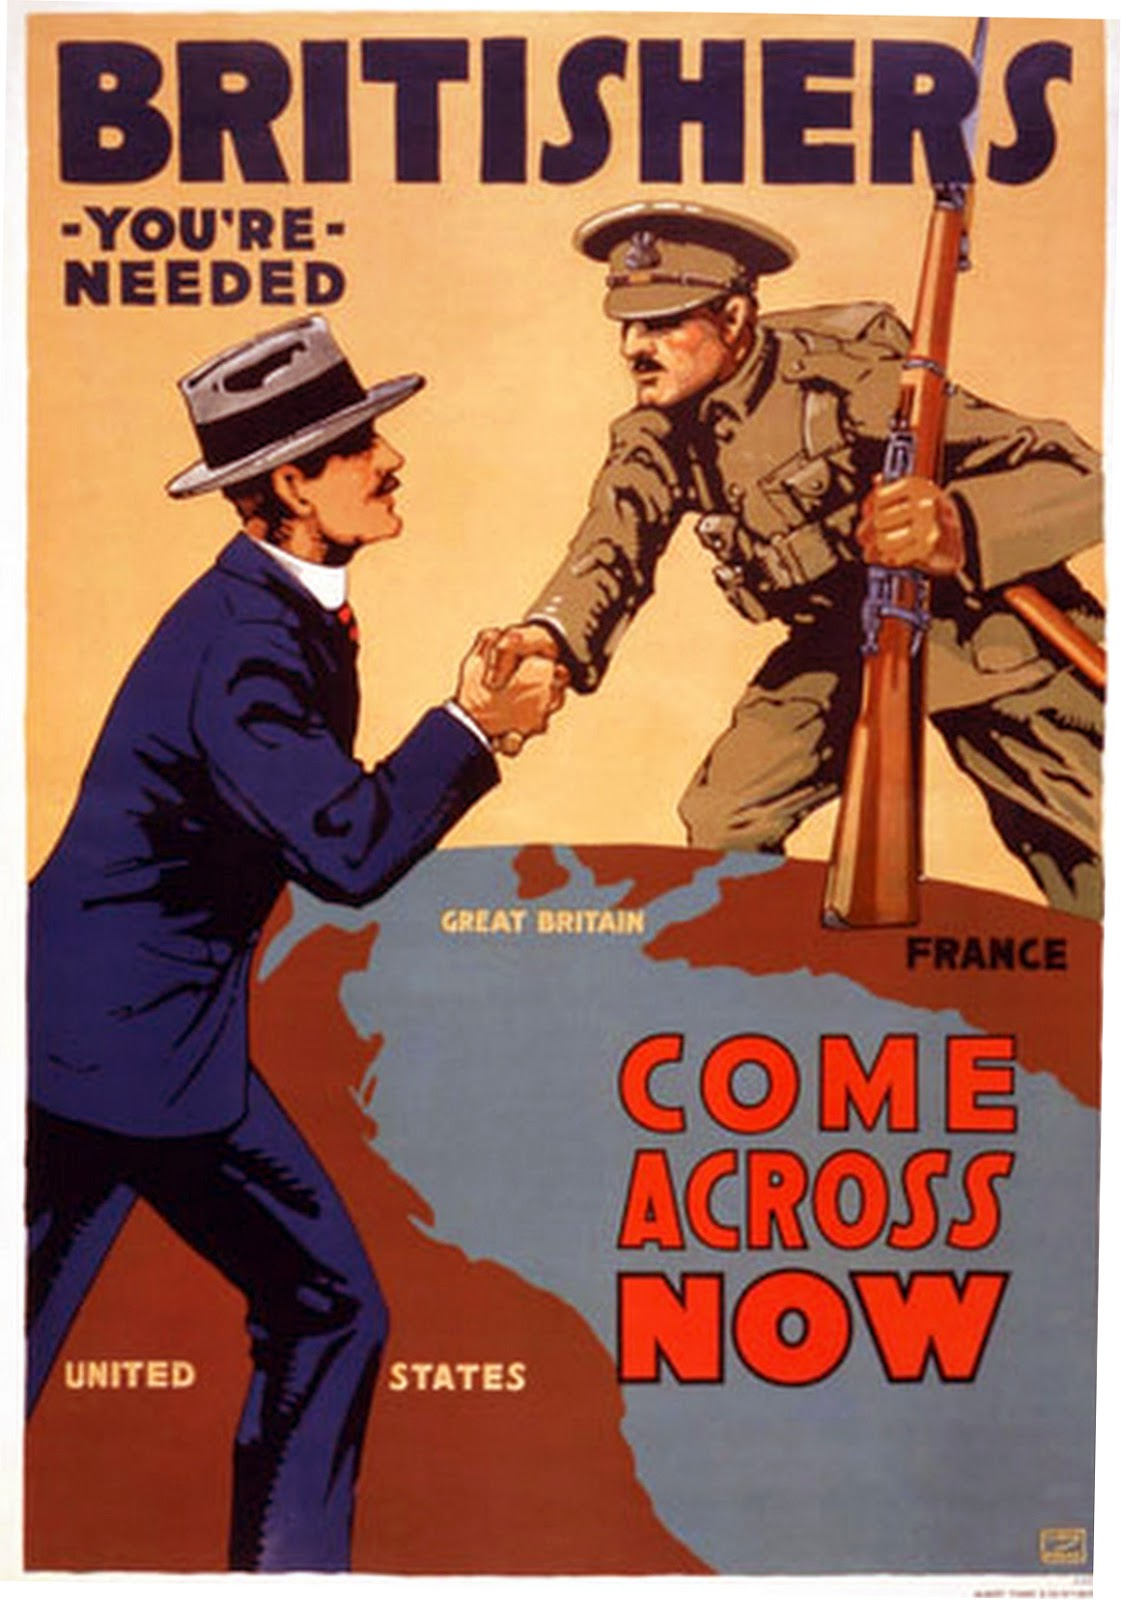 transpress nz: appeal to Britishers in America, WW1